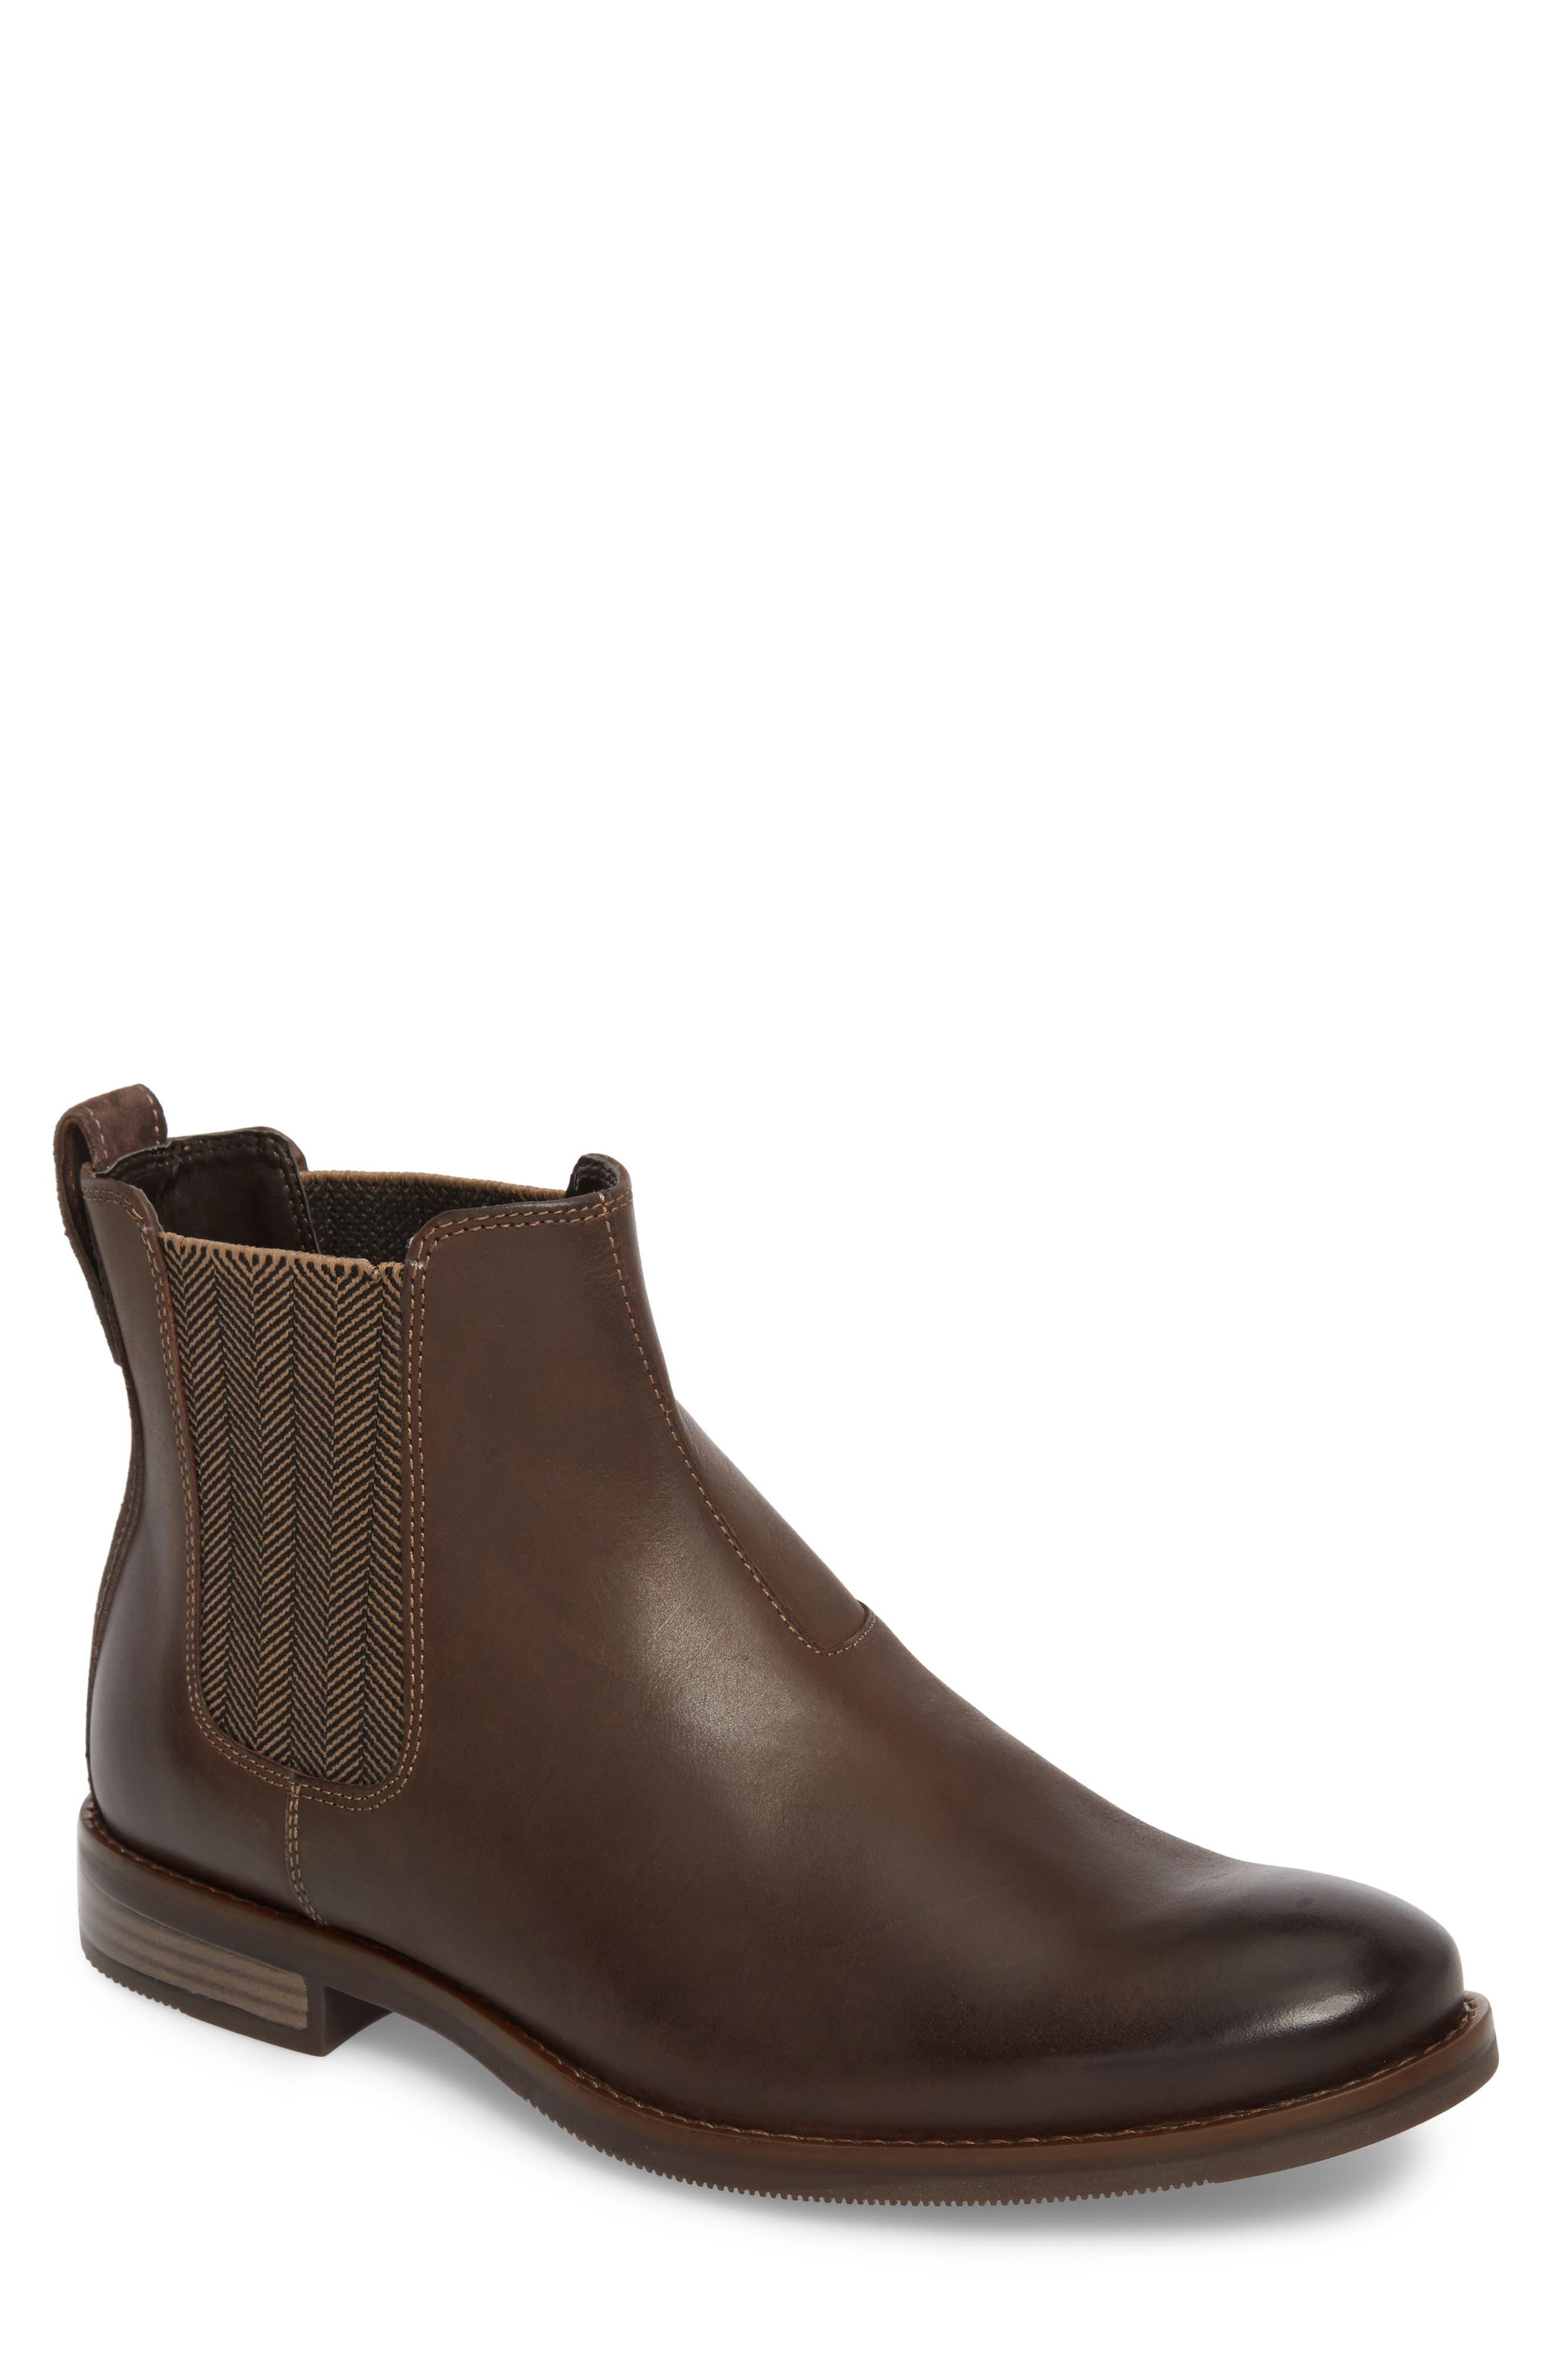 Alternate Image 1 Selected - Rockport Wynstin Chelsea Boot (Men)